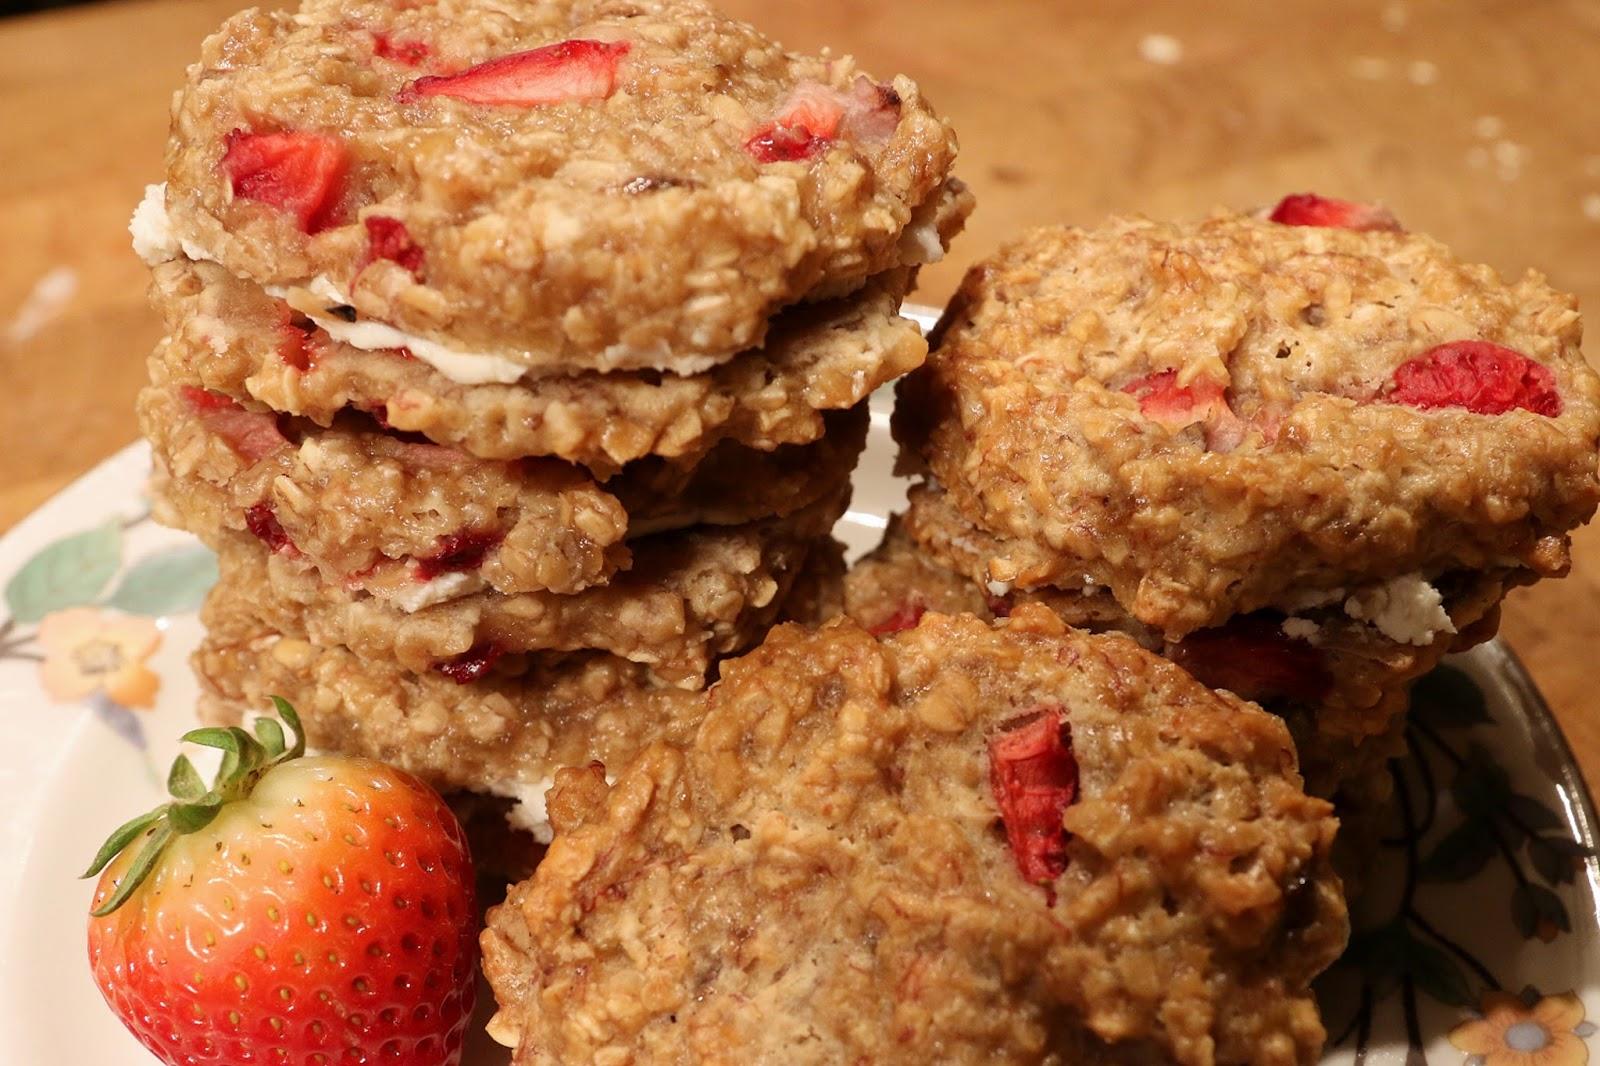 Accidental Cream Pie Classy blackberry morning: strawberry oatmeal cream pies (low sugar)